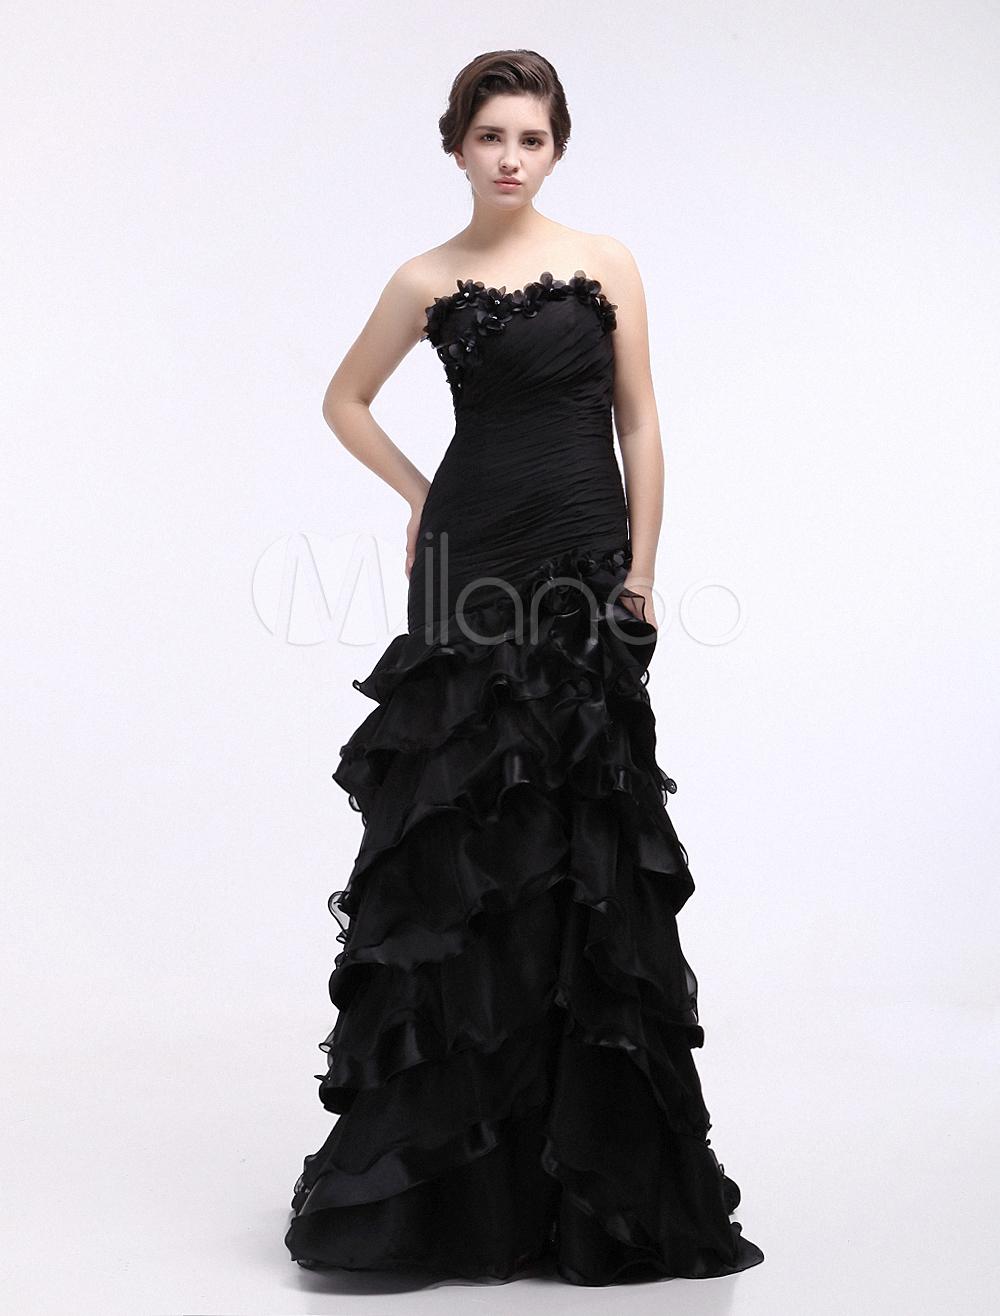 Black Wedding Dress Sweetheart Organza Ruffles Prom Dress (Prom Dresses) photo